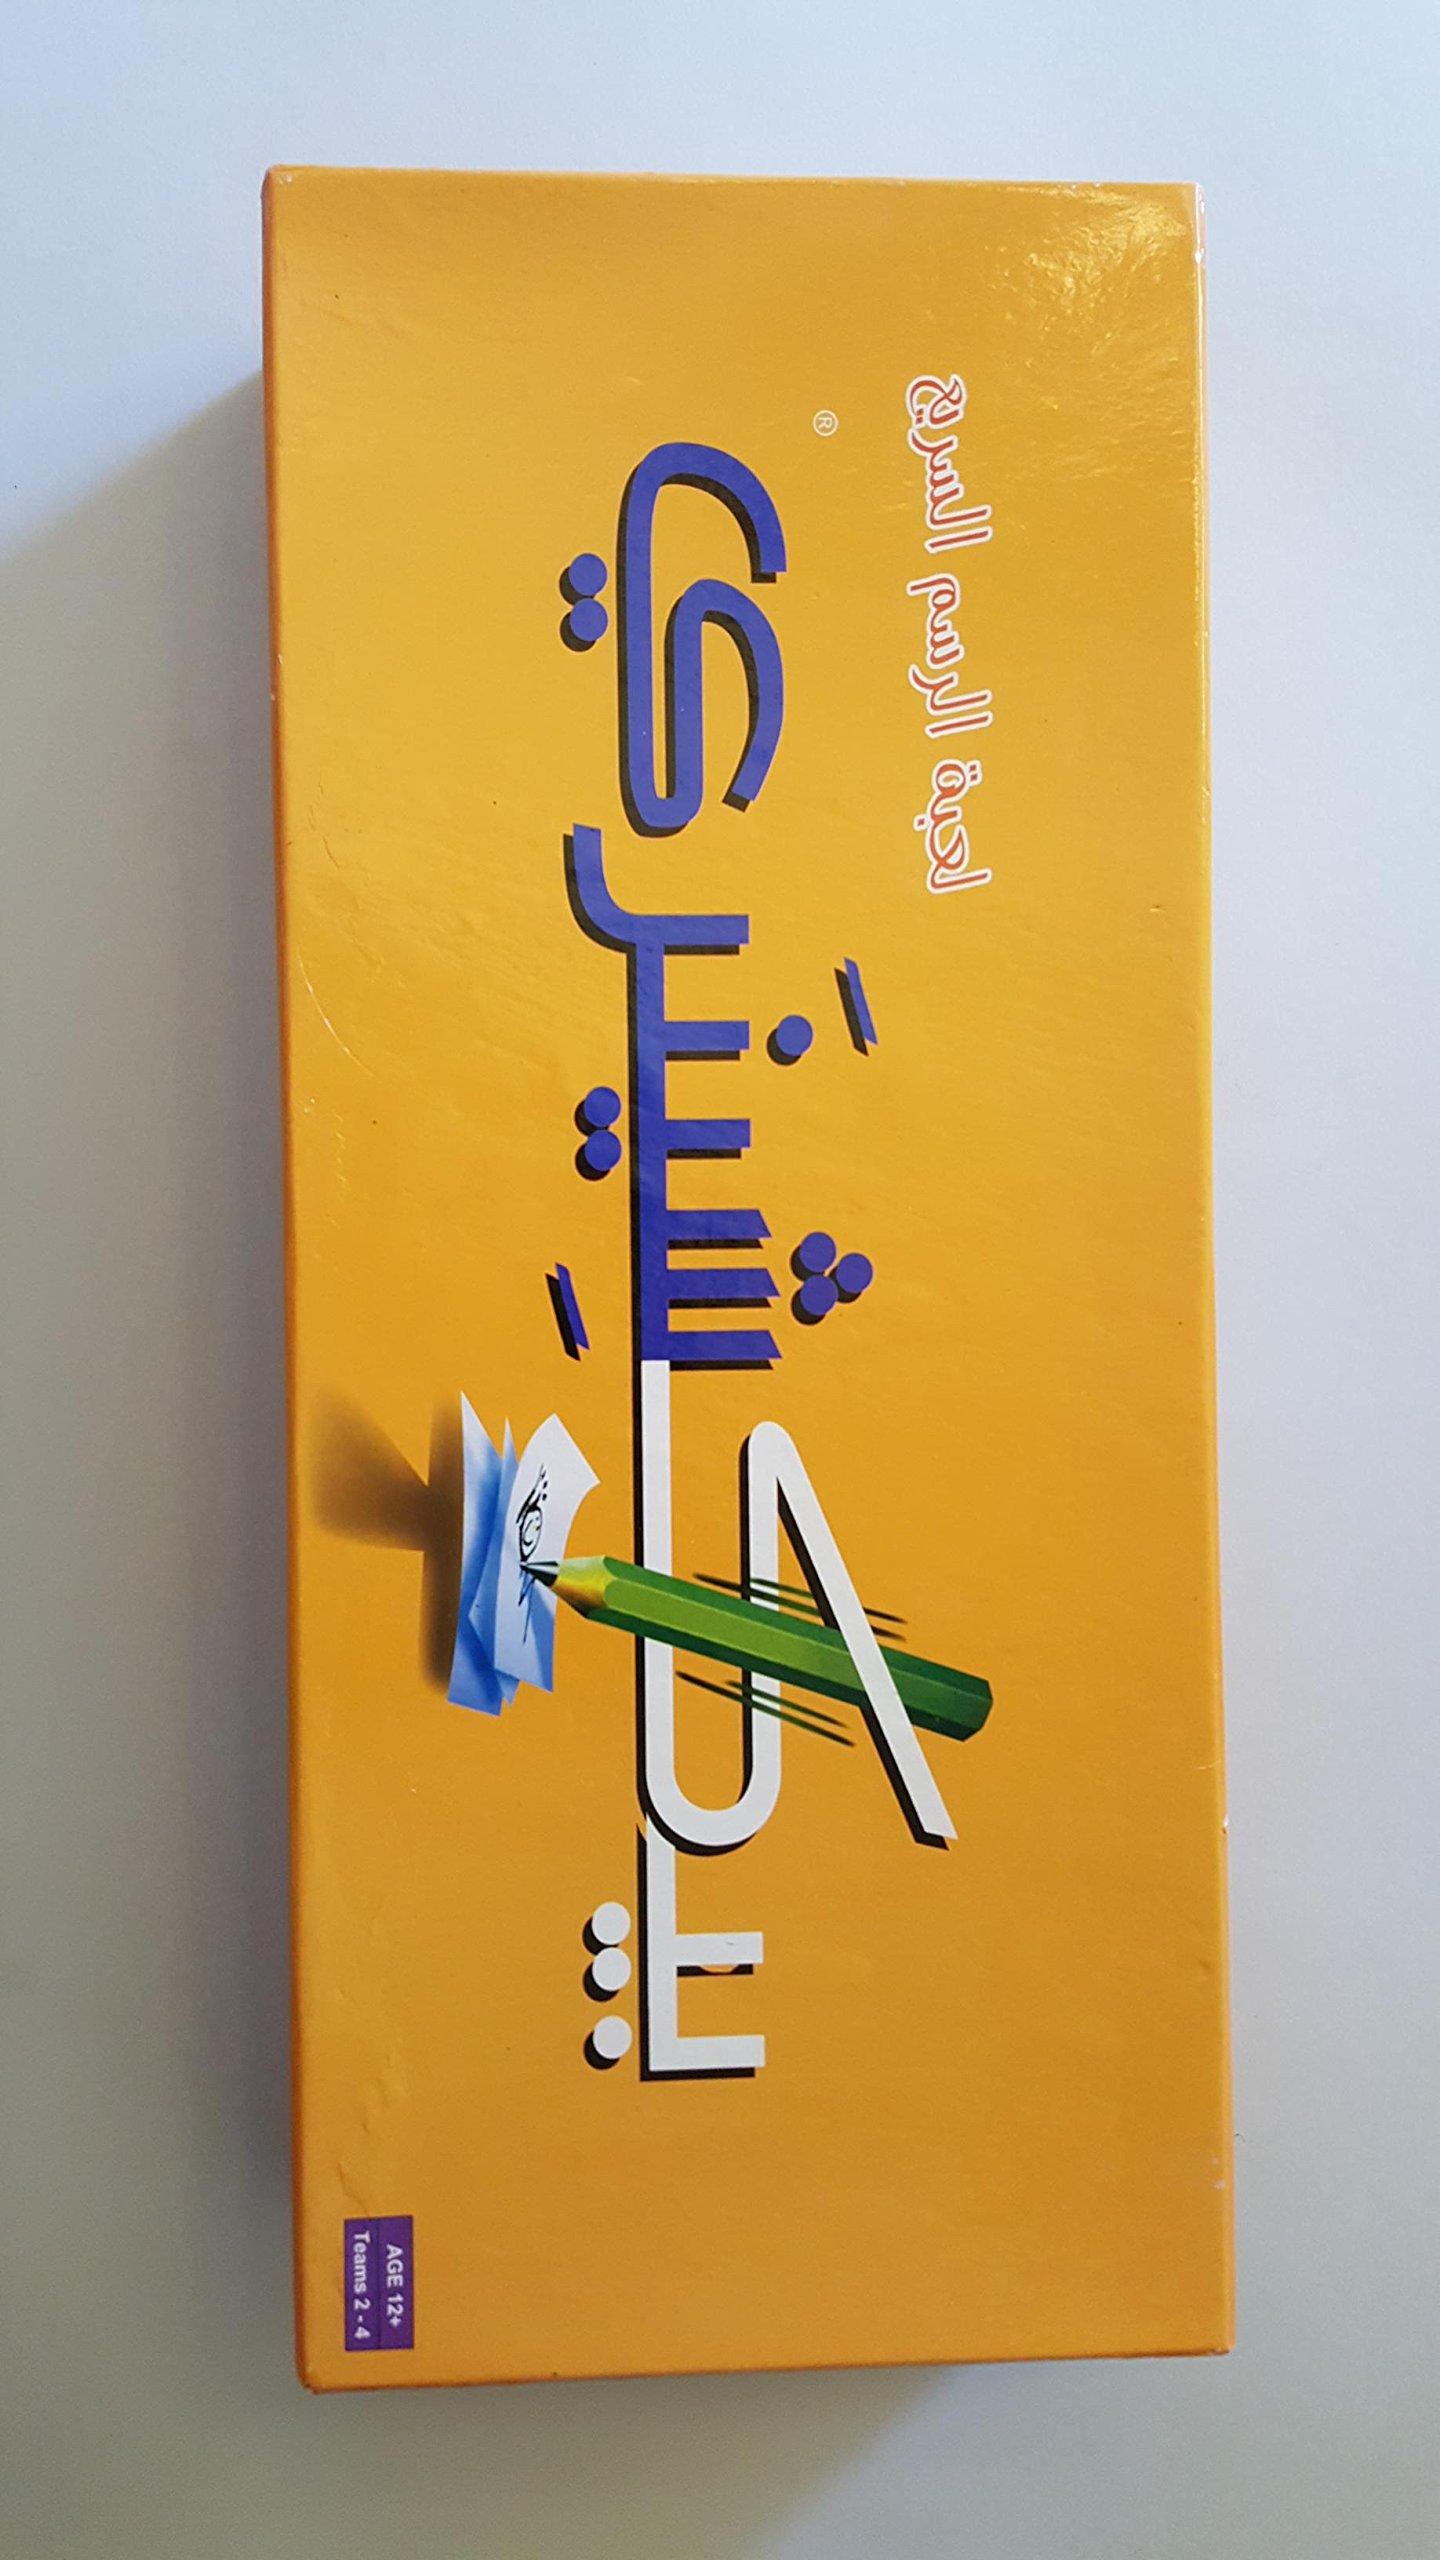 Arabic Pictionary The Game of Quick Draw بيكشينري لعبة الرسم السريع